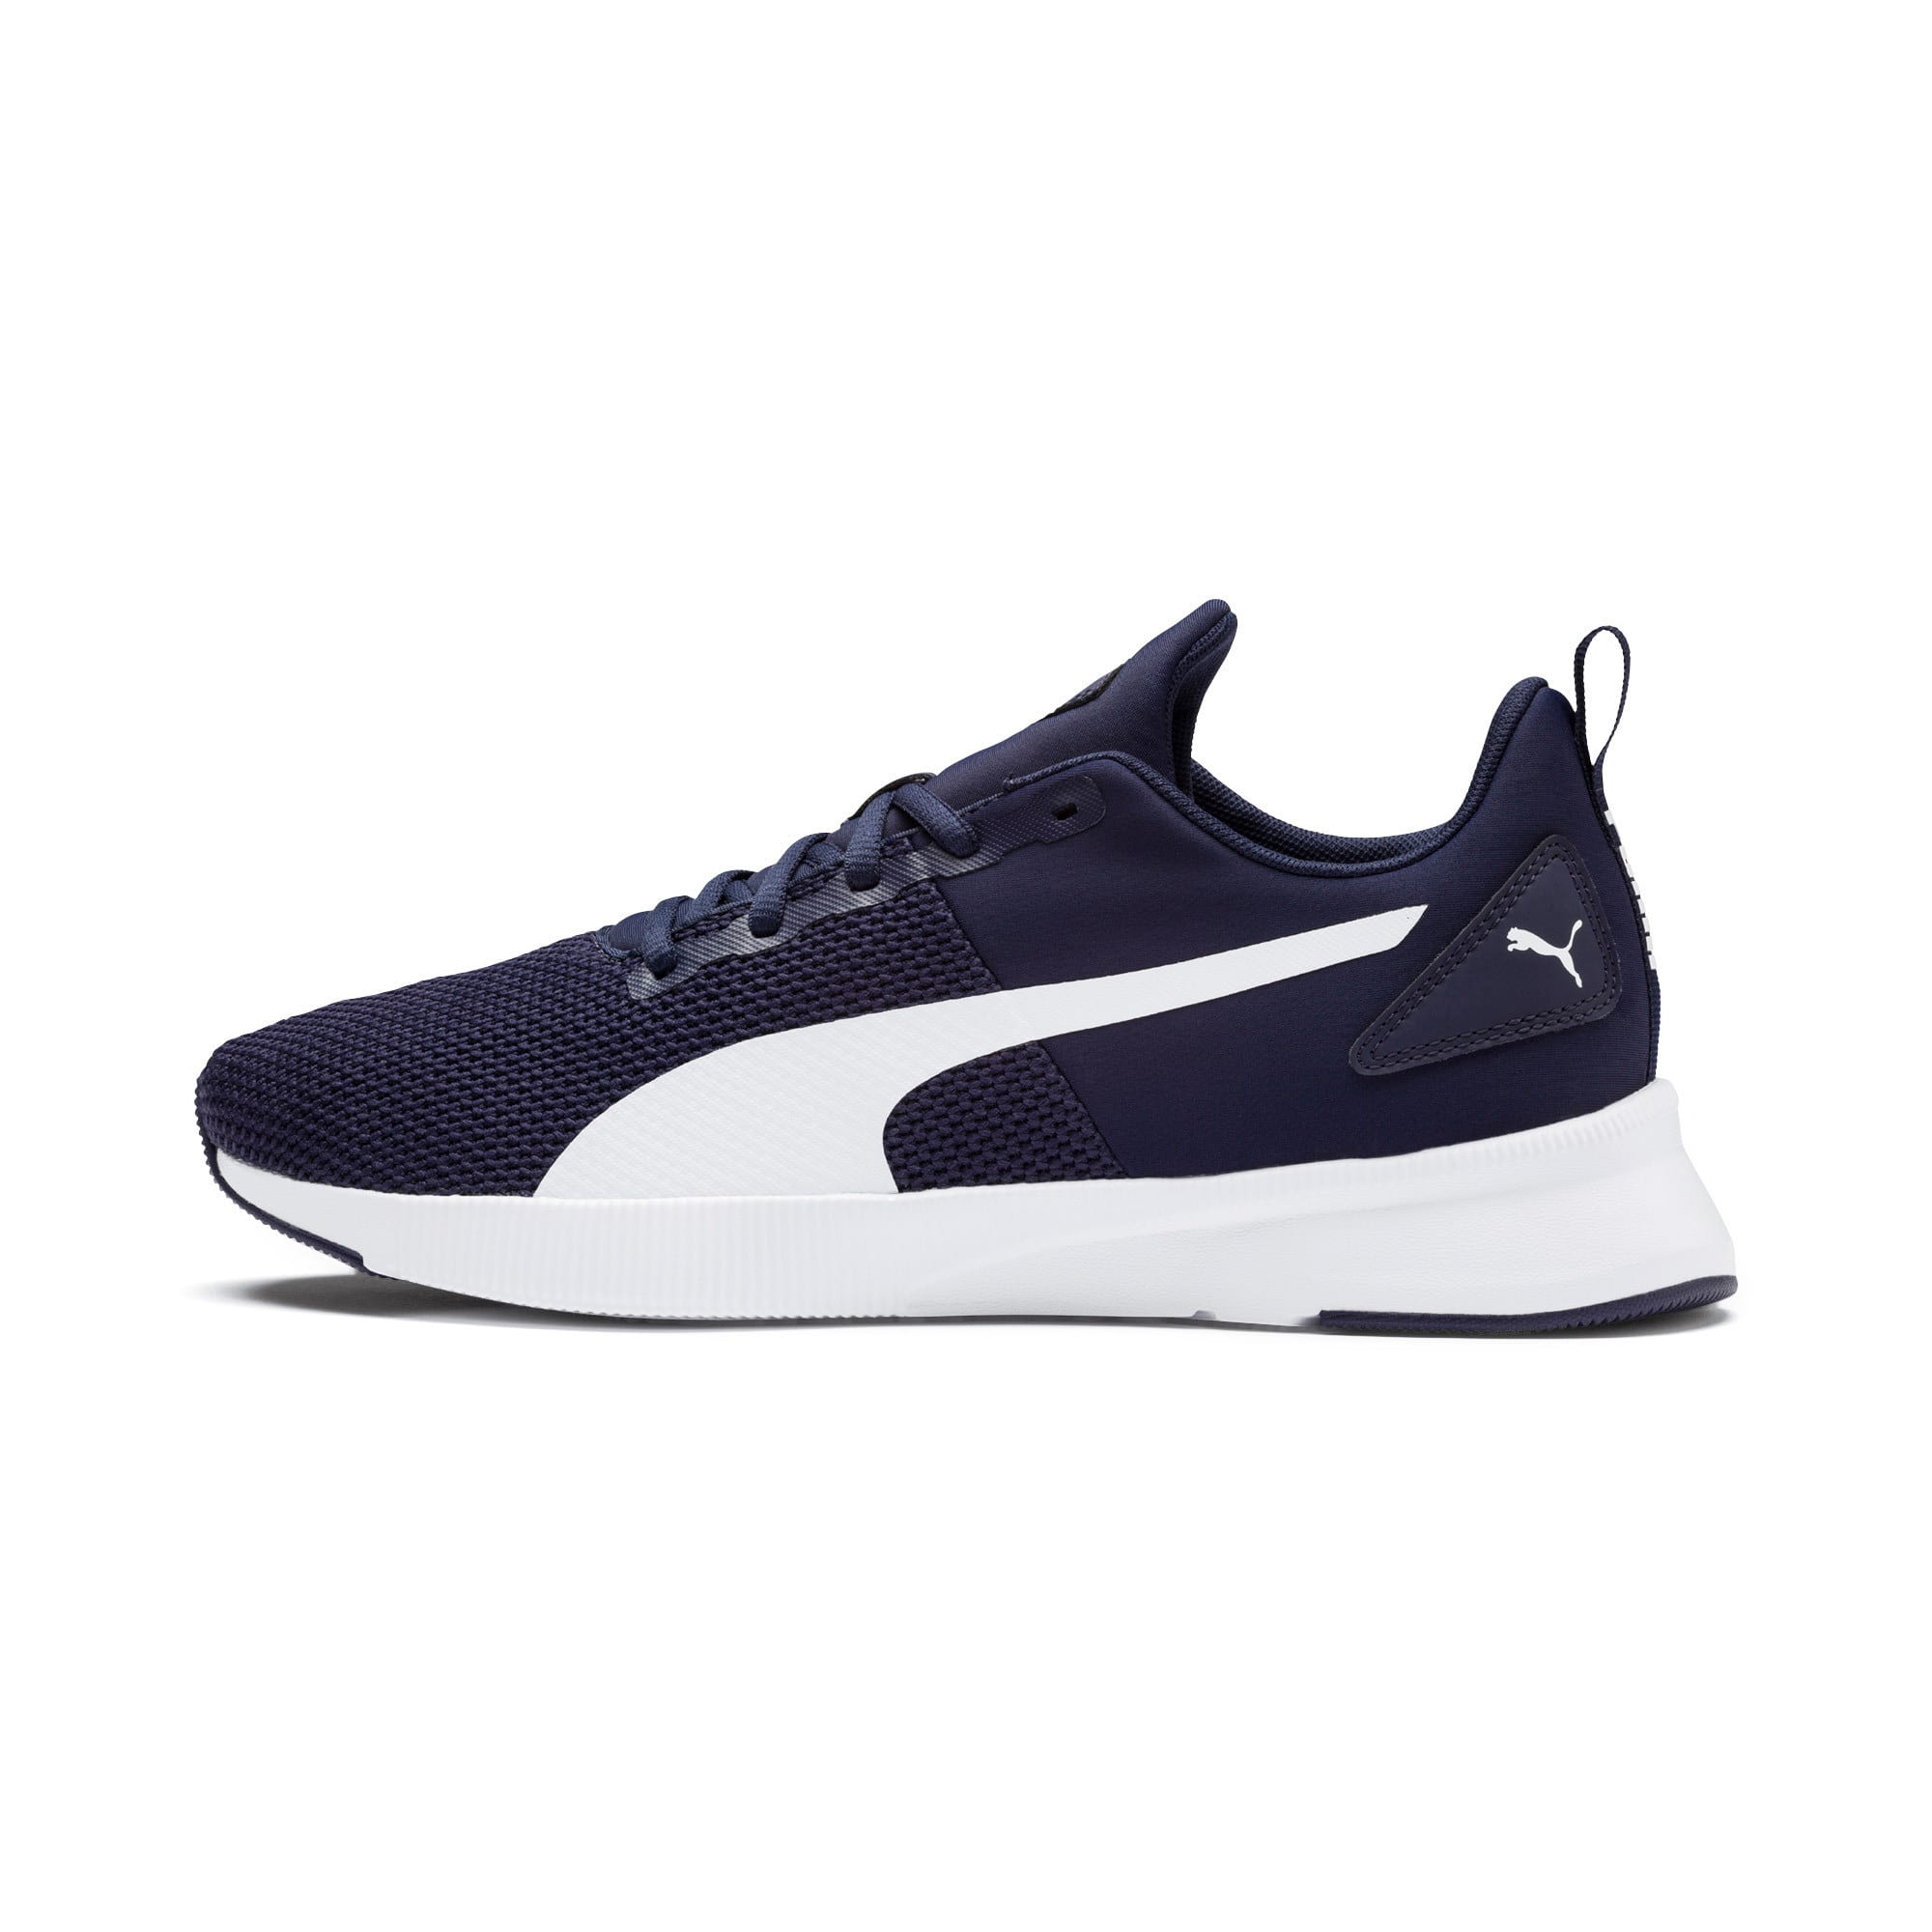 Thumbnail 1 of Flyer Runner Running Shoes, Peacoat-Puma White, medium